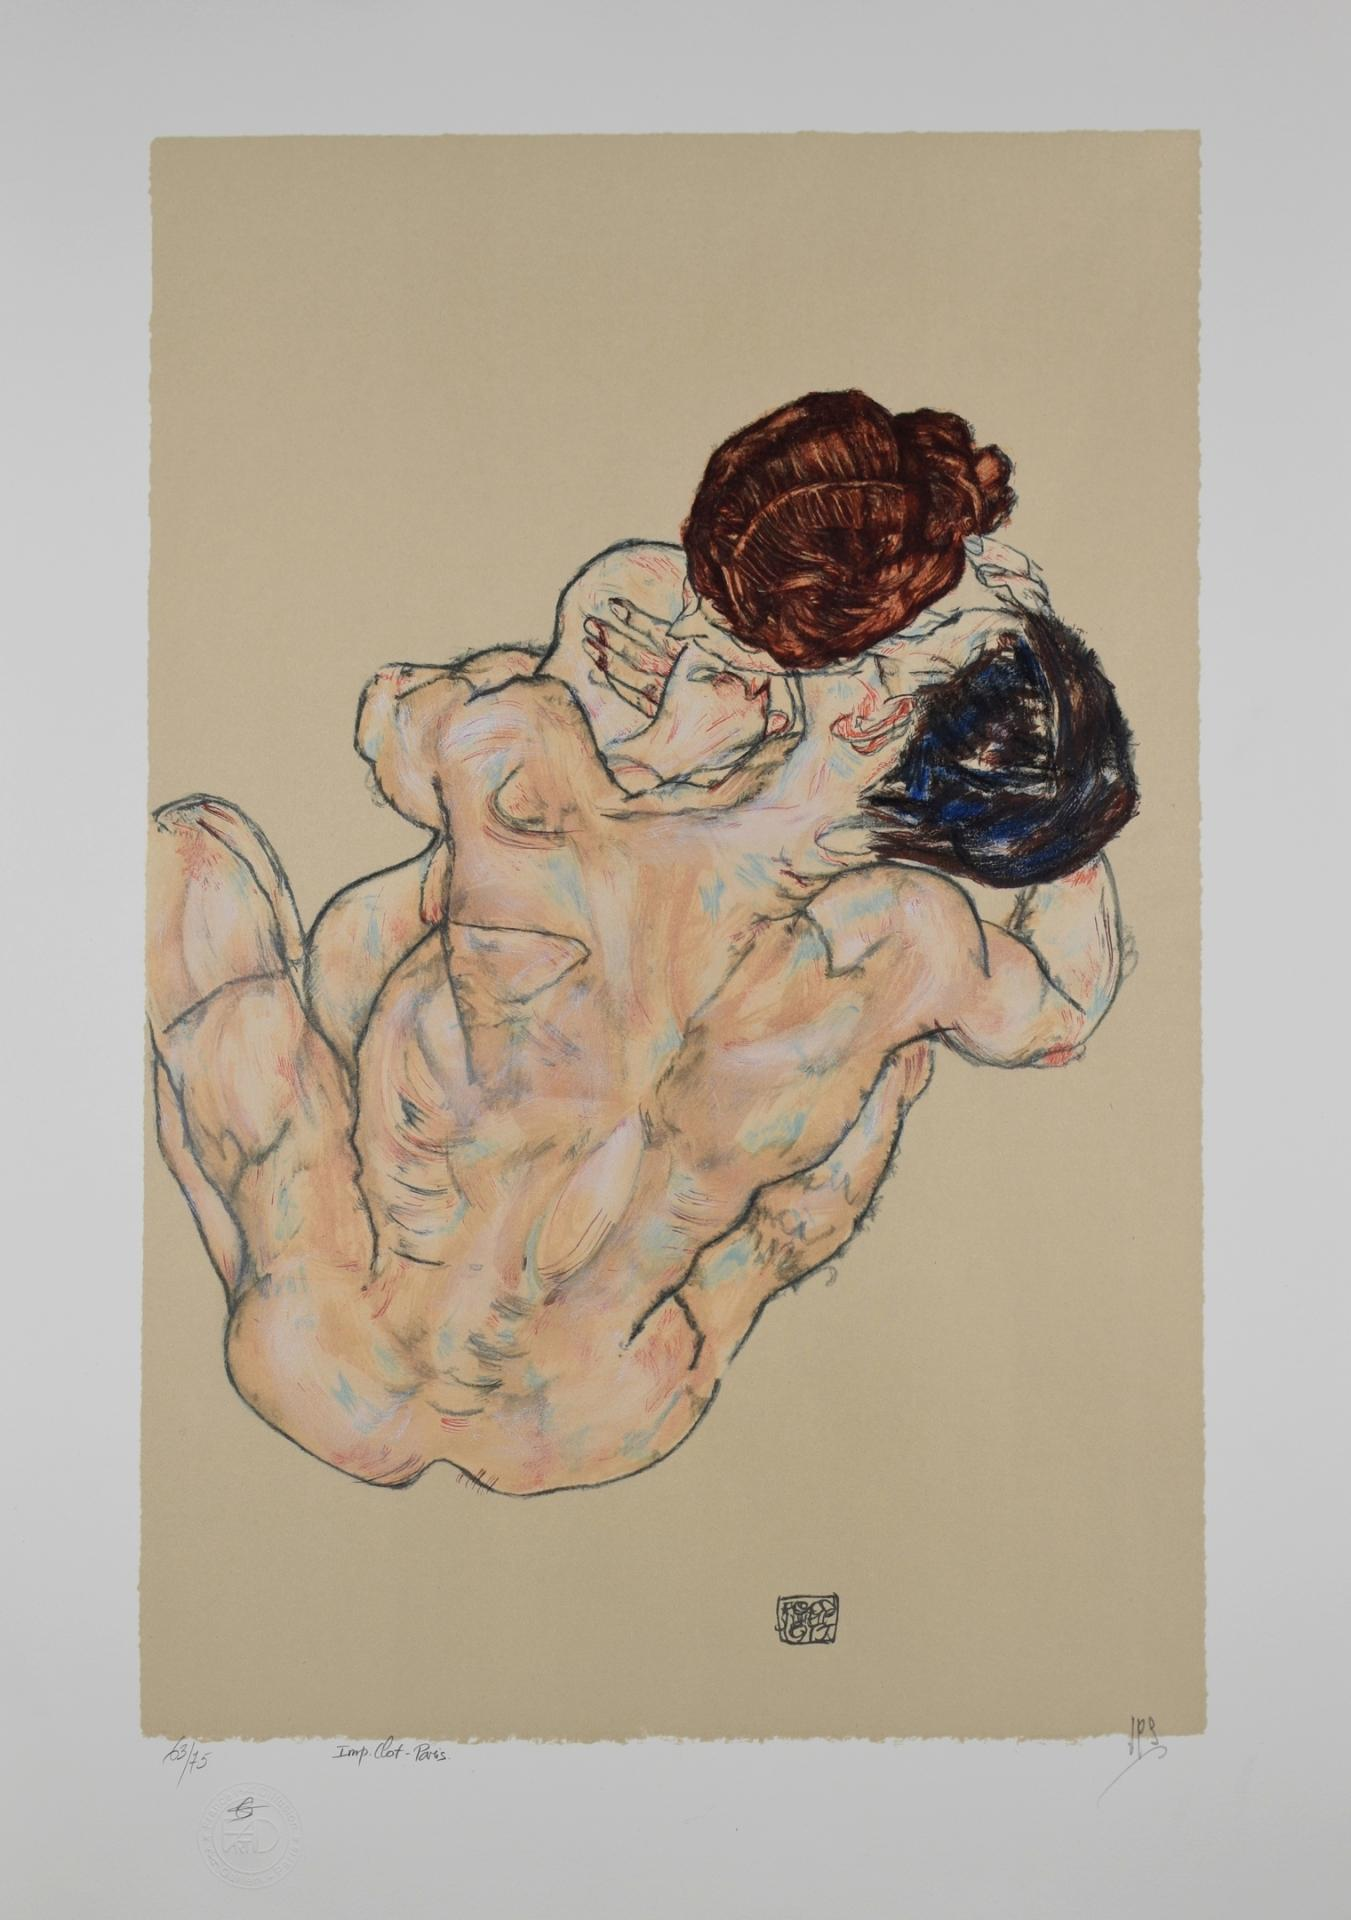 EGON SCHIELE | Lithographie | Lovers, 1917 (Mann und Frau, umarmung)